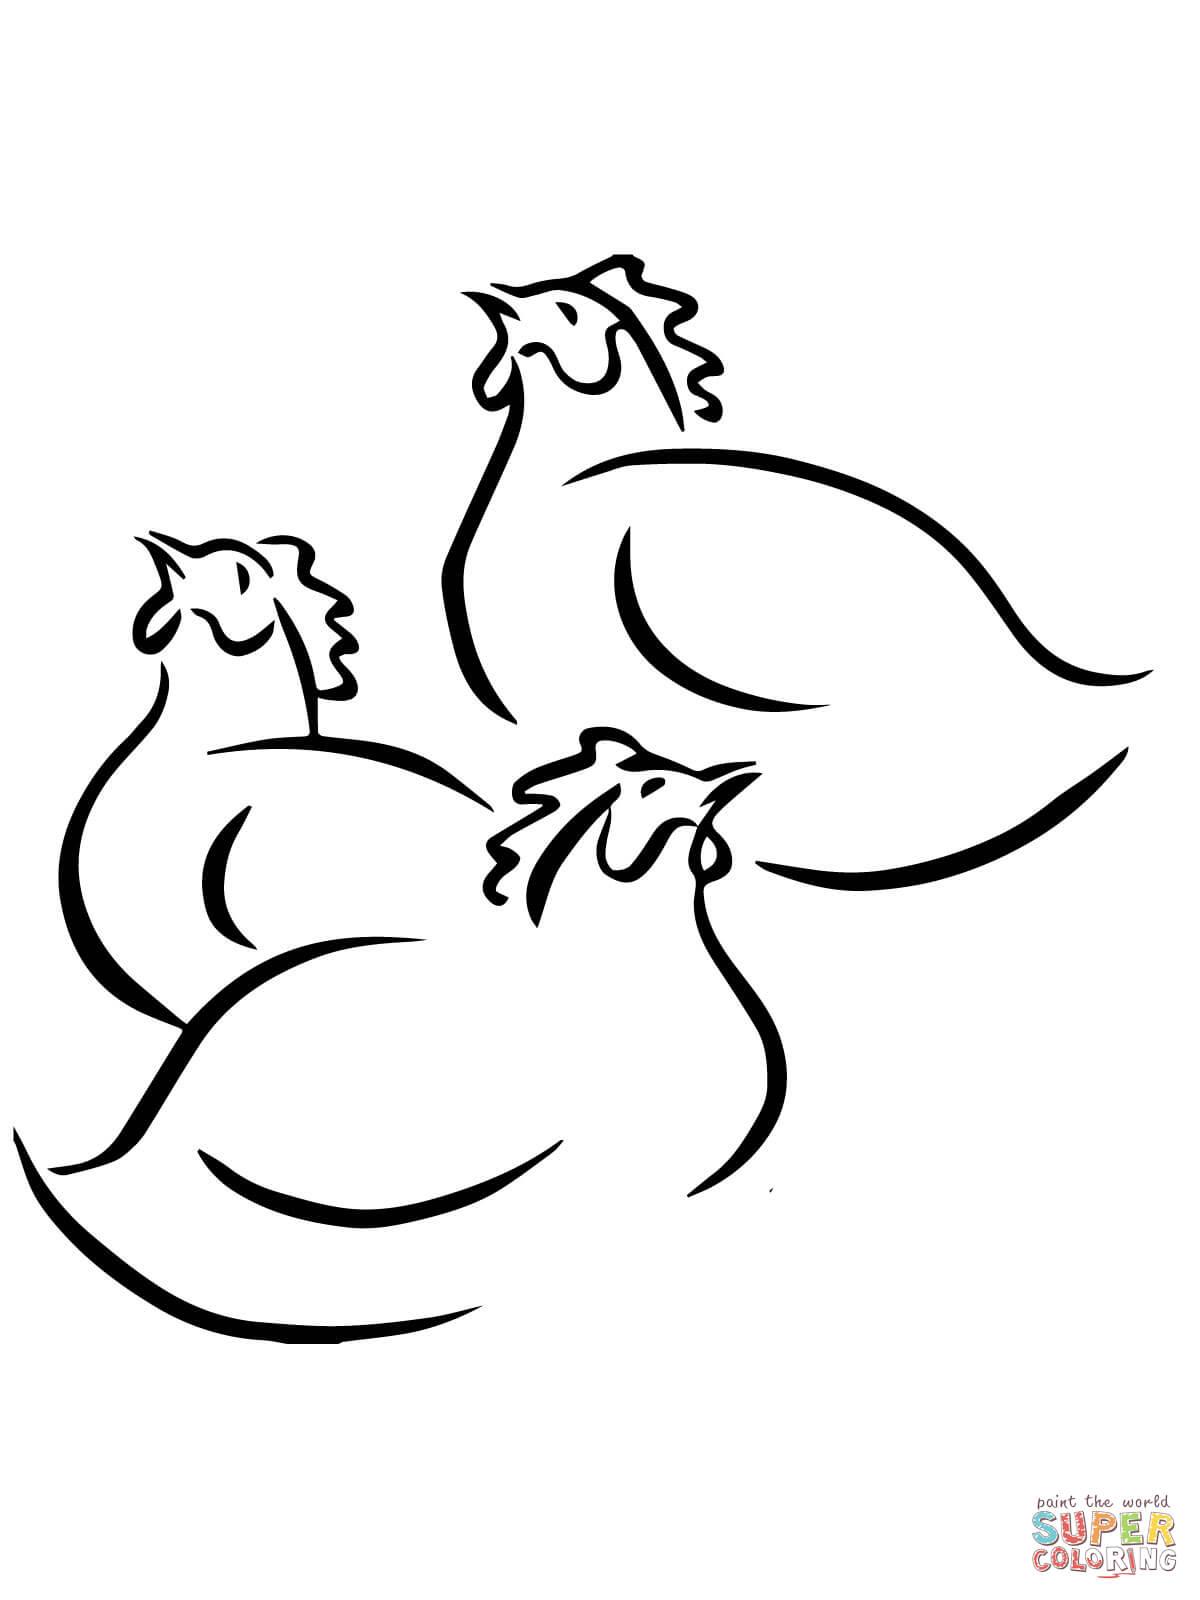 Chicken coloring